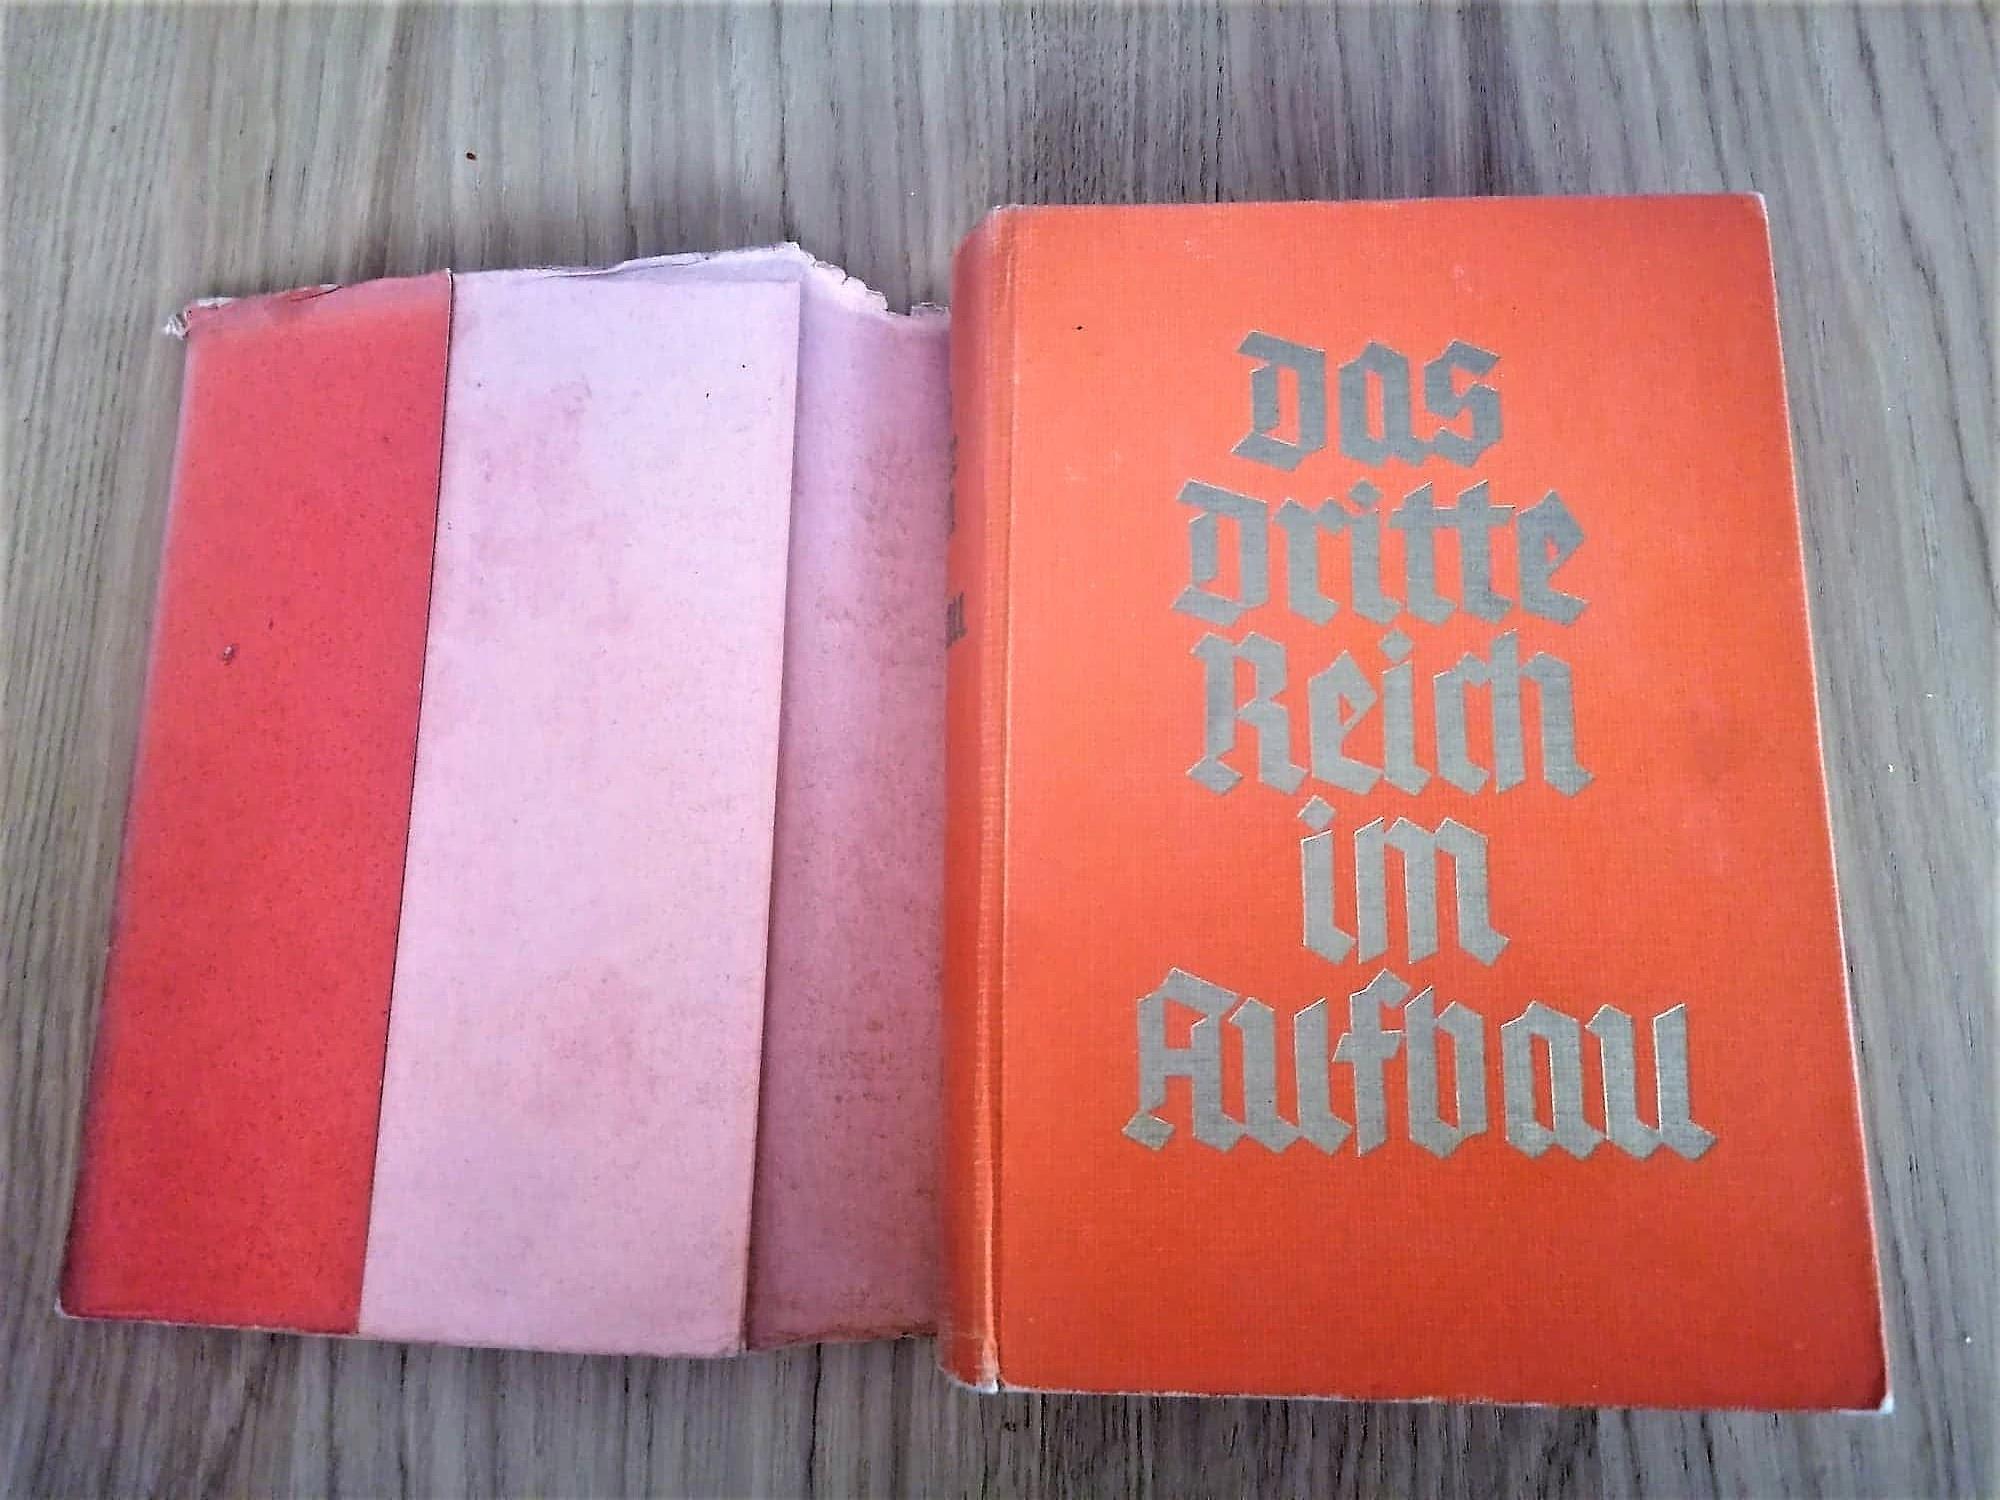 Книга DAS DRITTE REICH IM AUFBAU 1941 том 5 часть 4